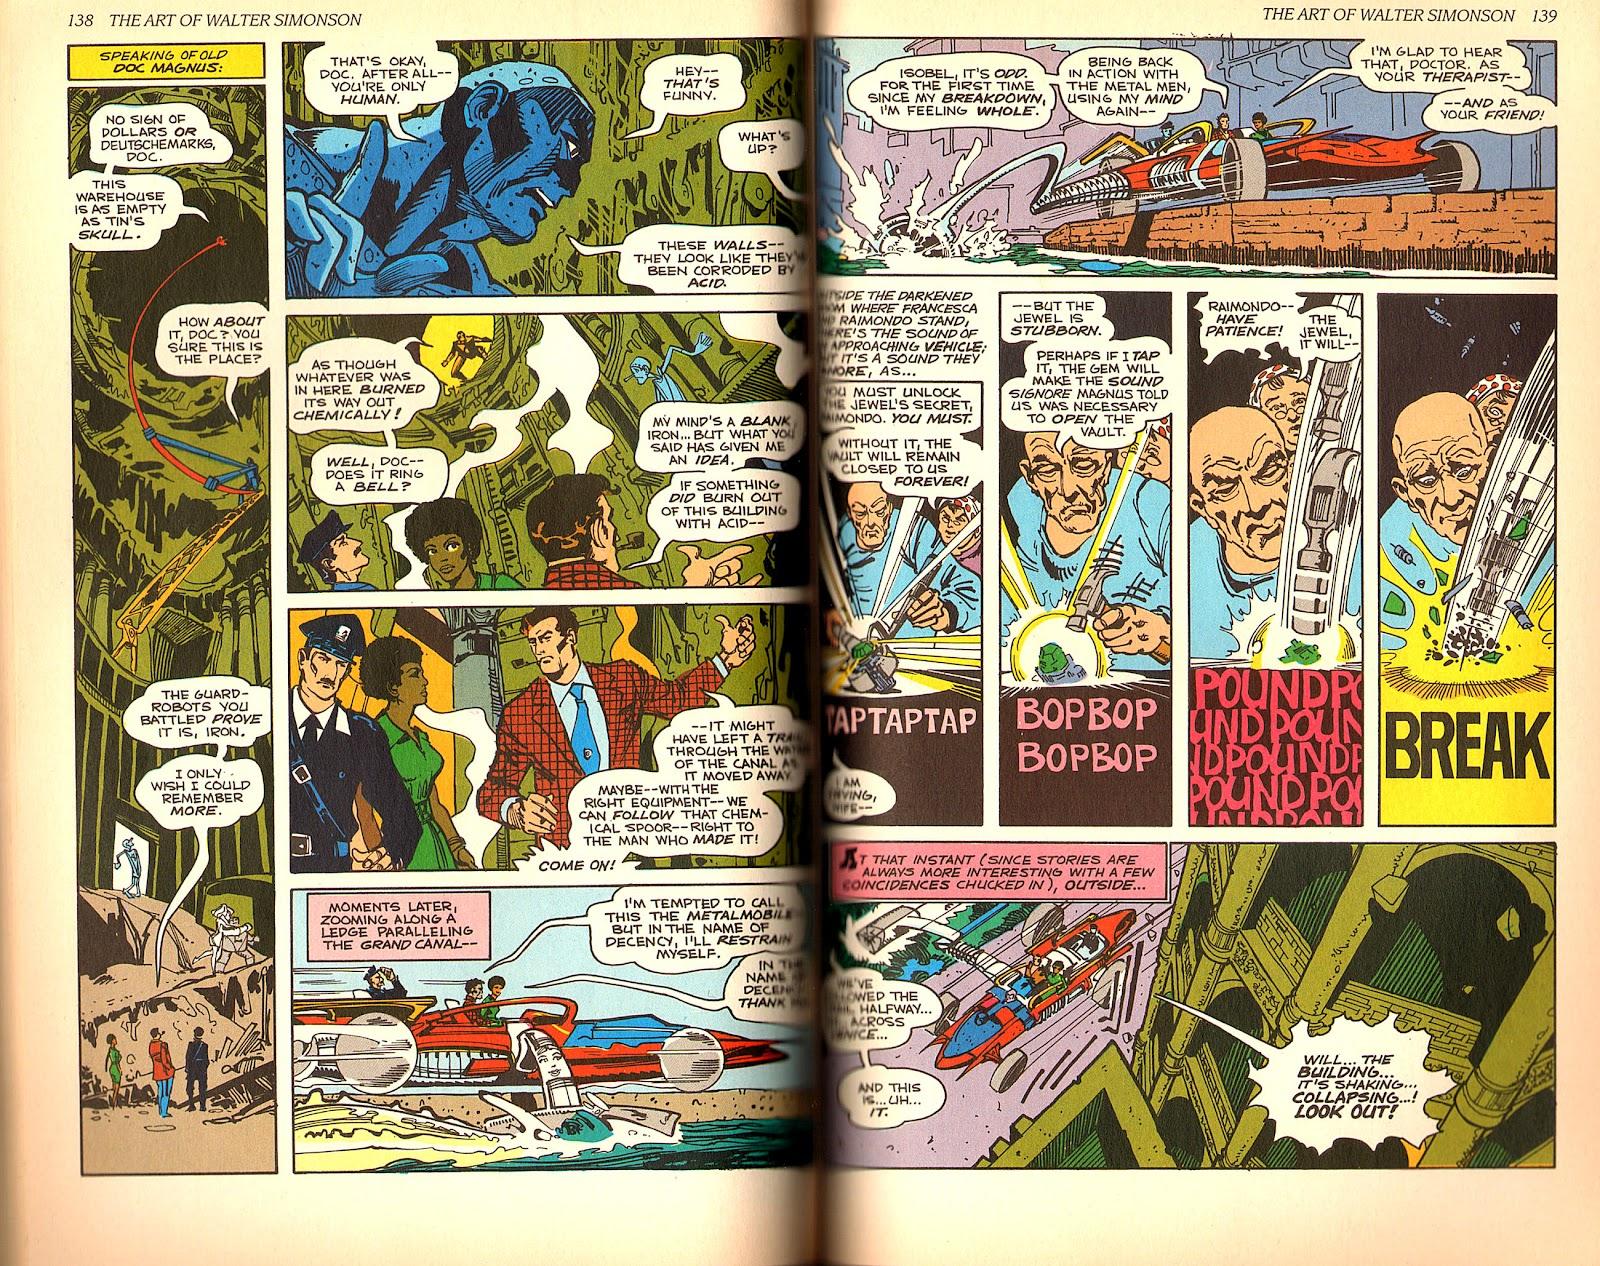 Read online The Art of Walter Simonson comic -  Issue # TPB - 71